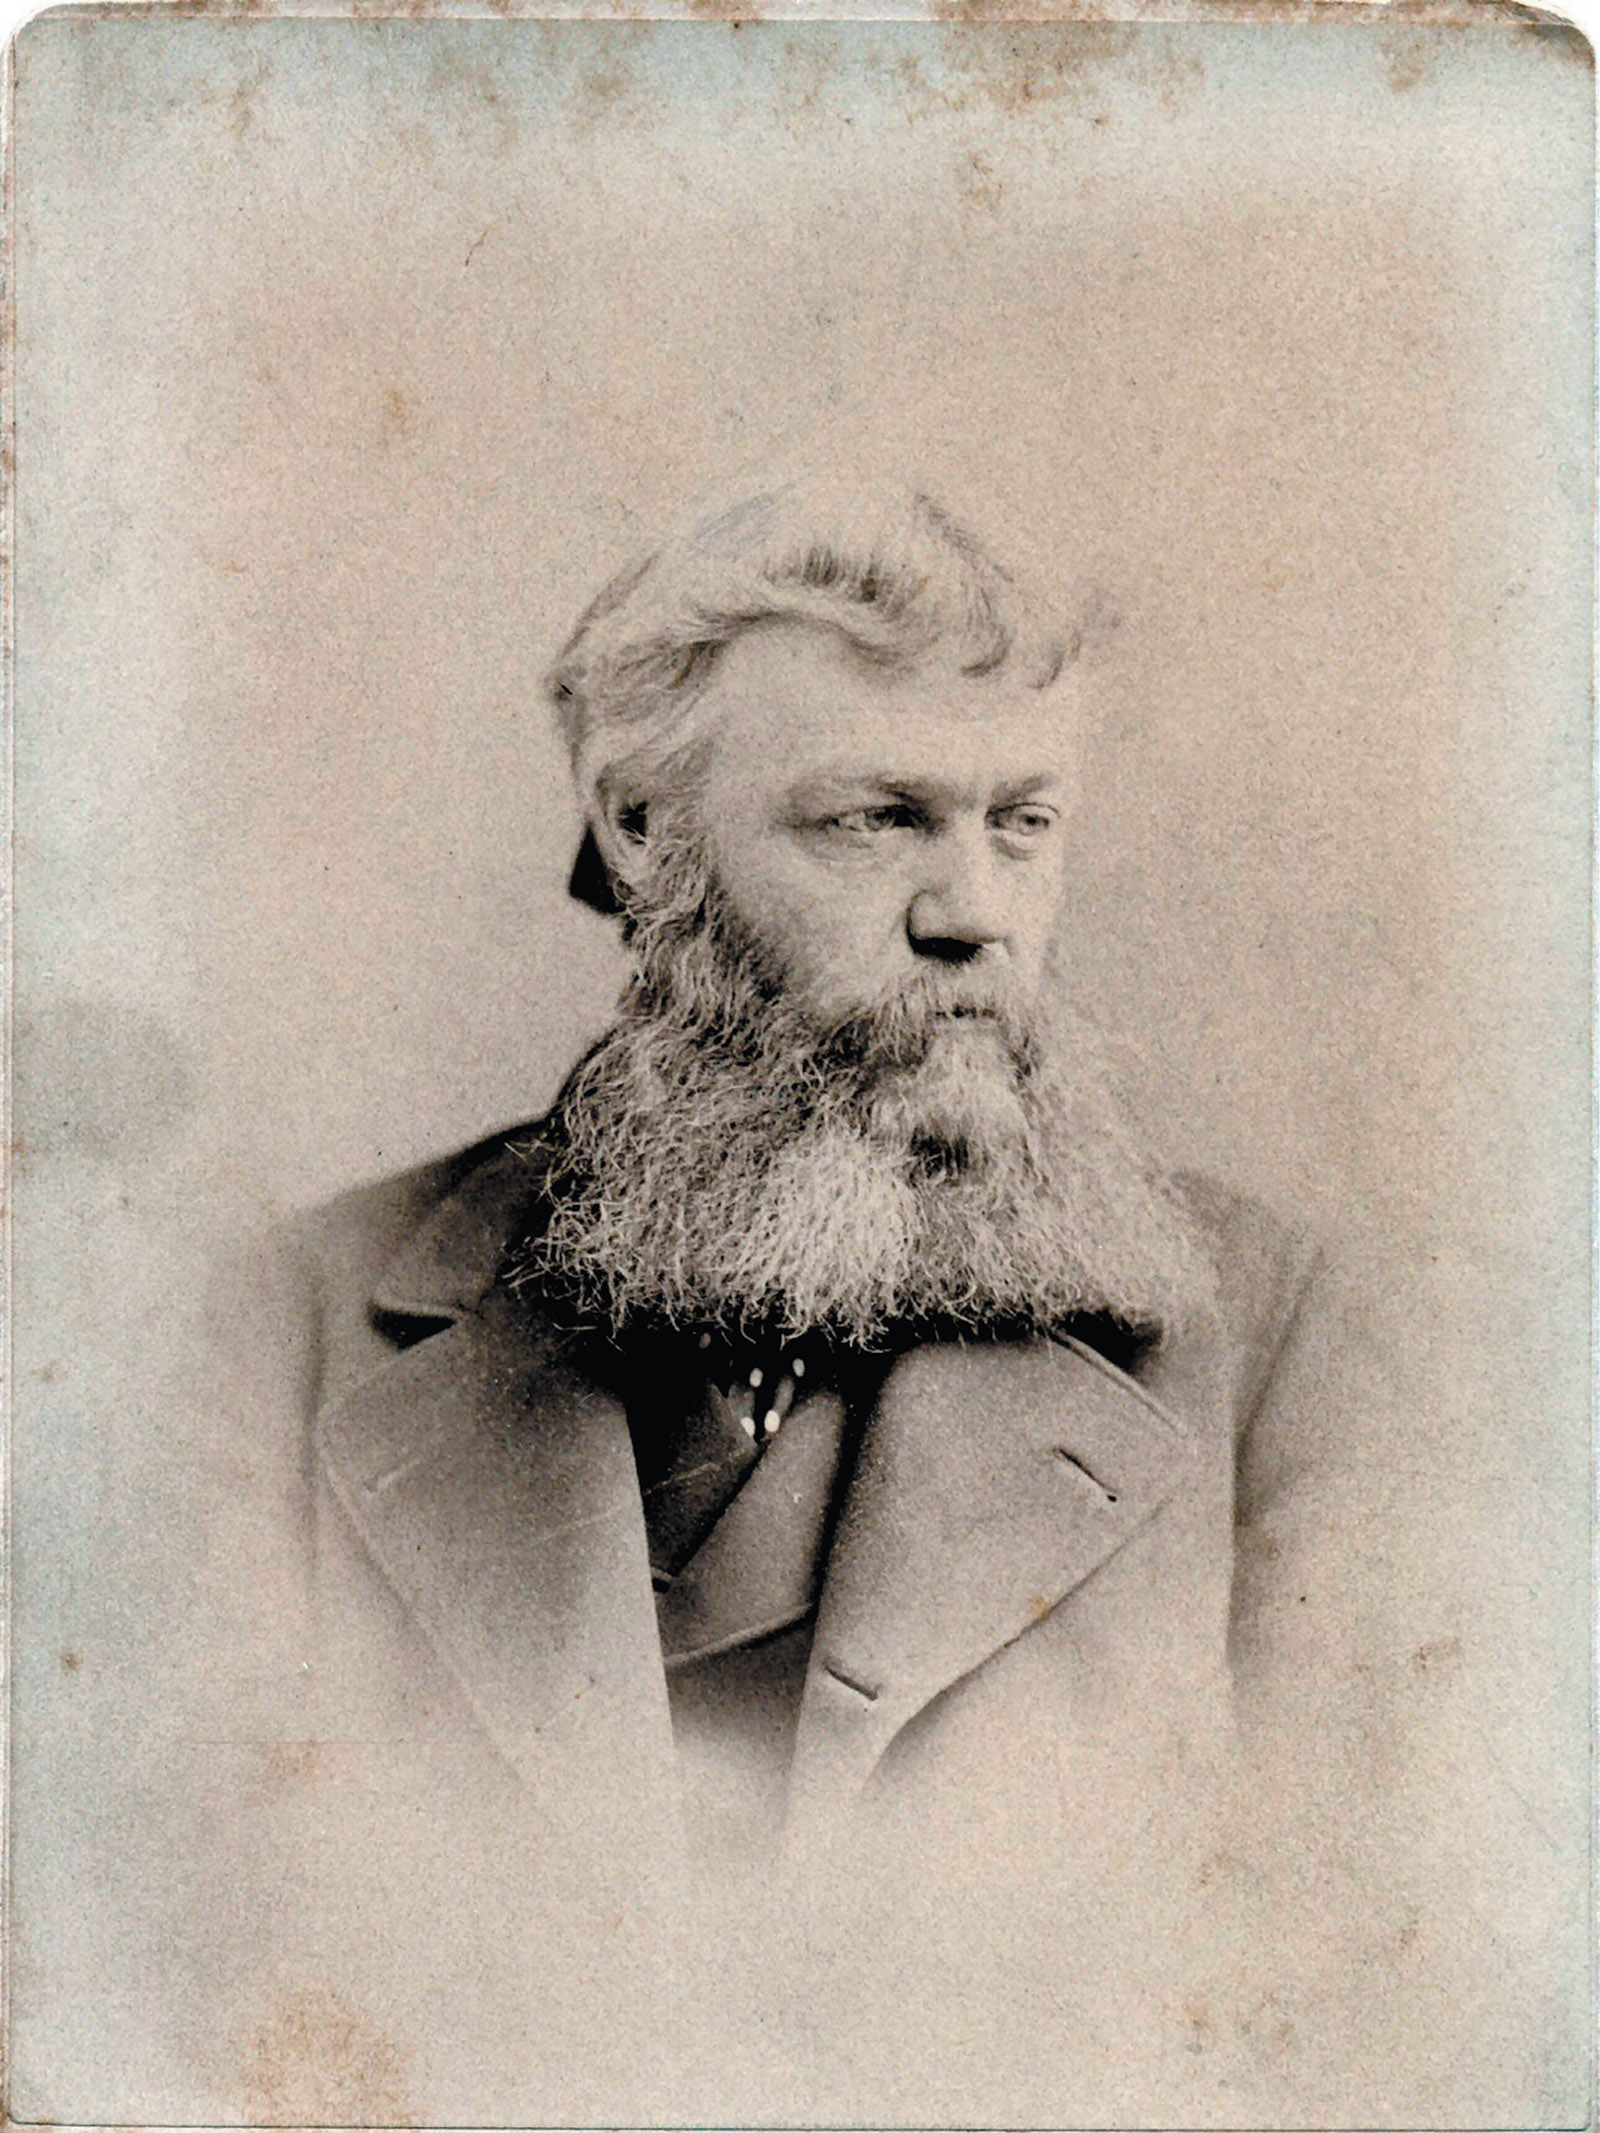 Frank Furness, circa 1873